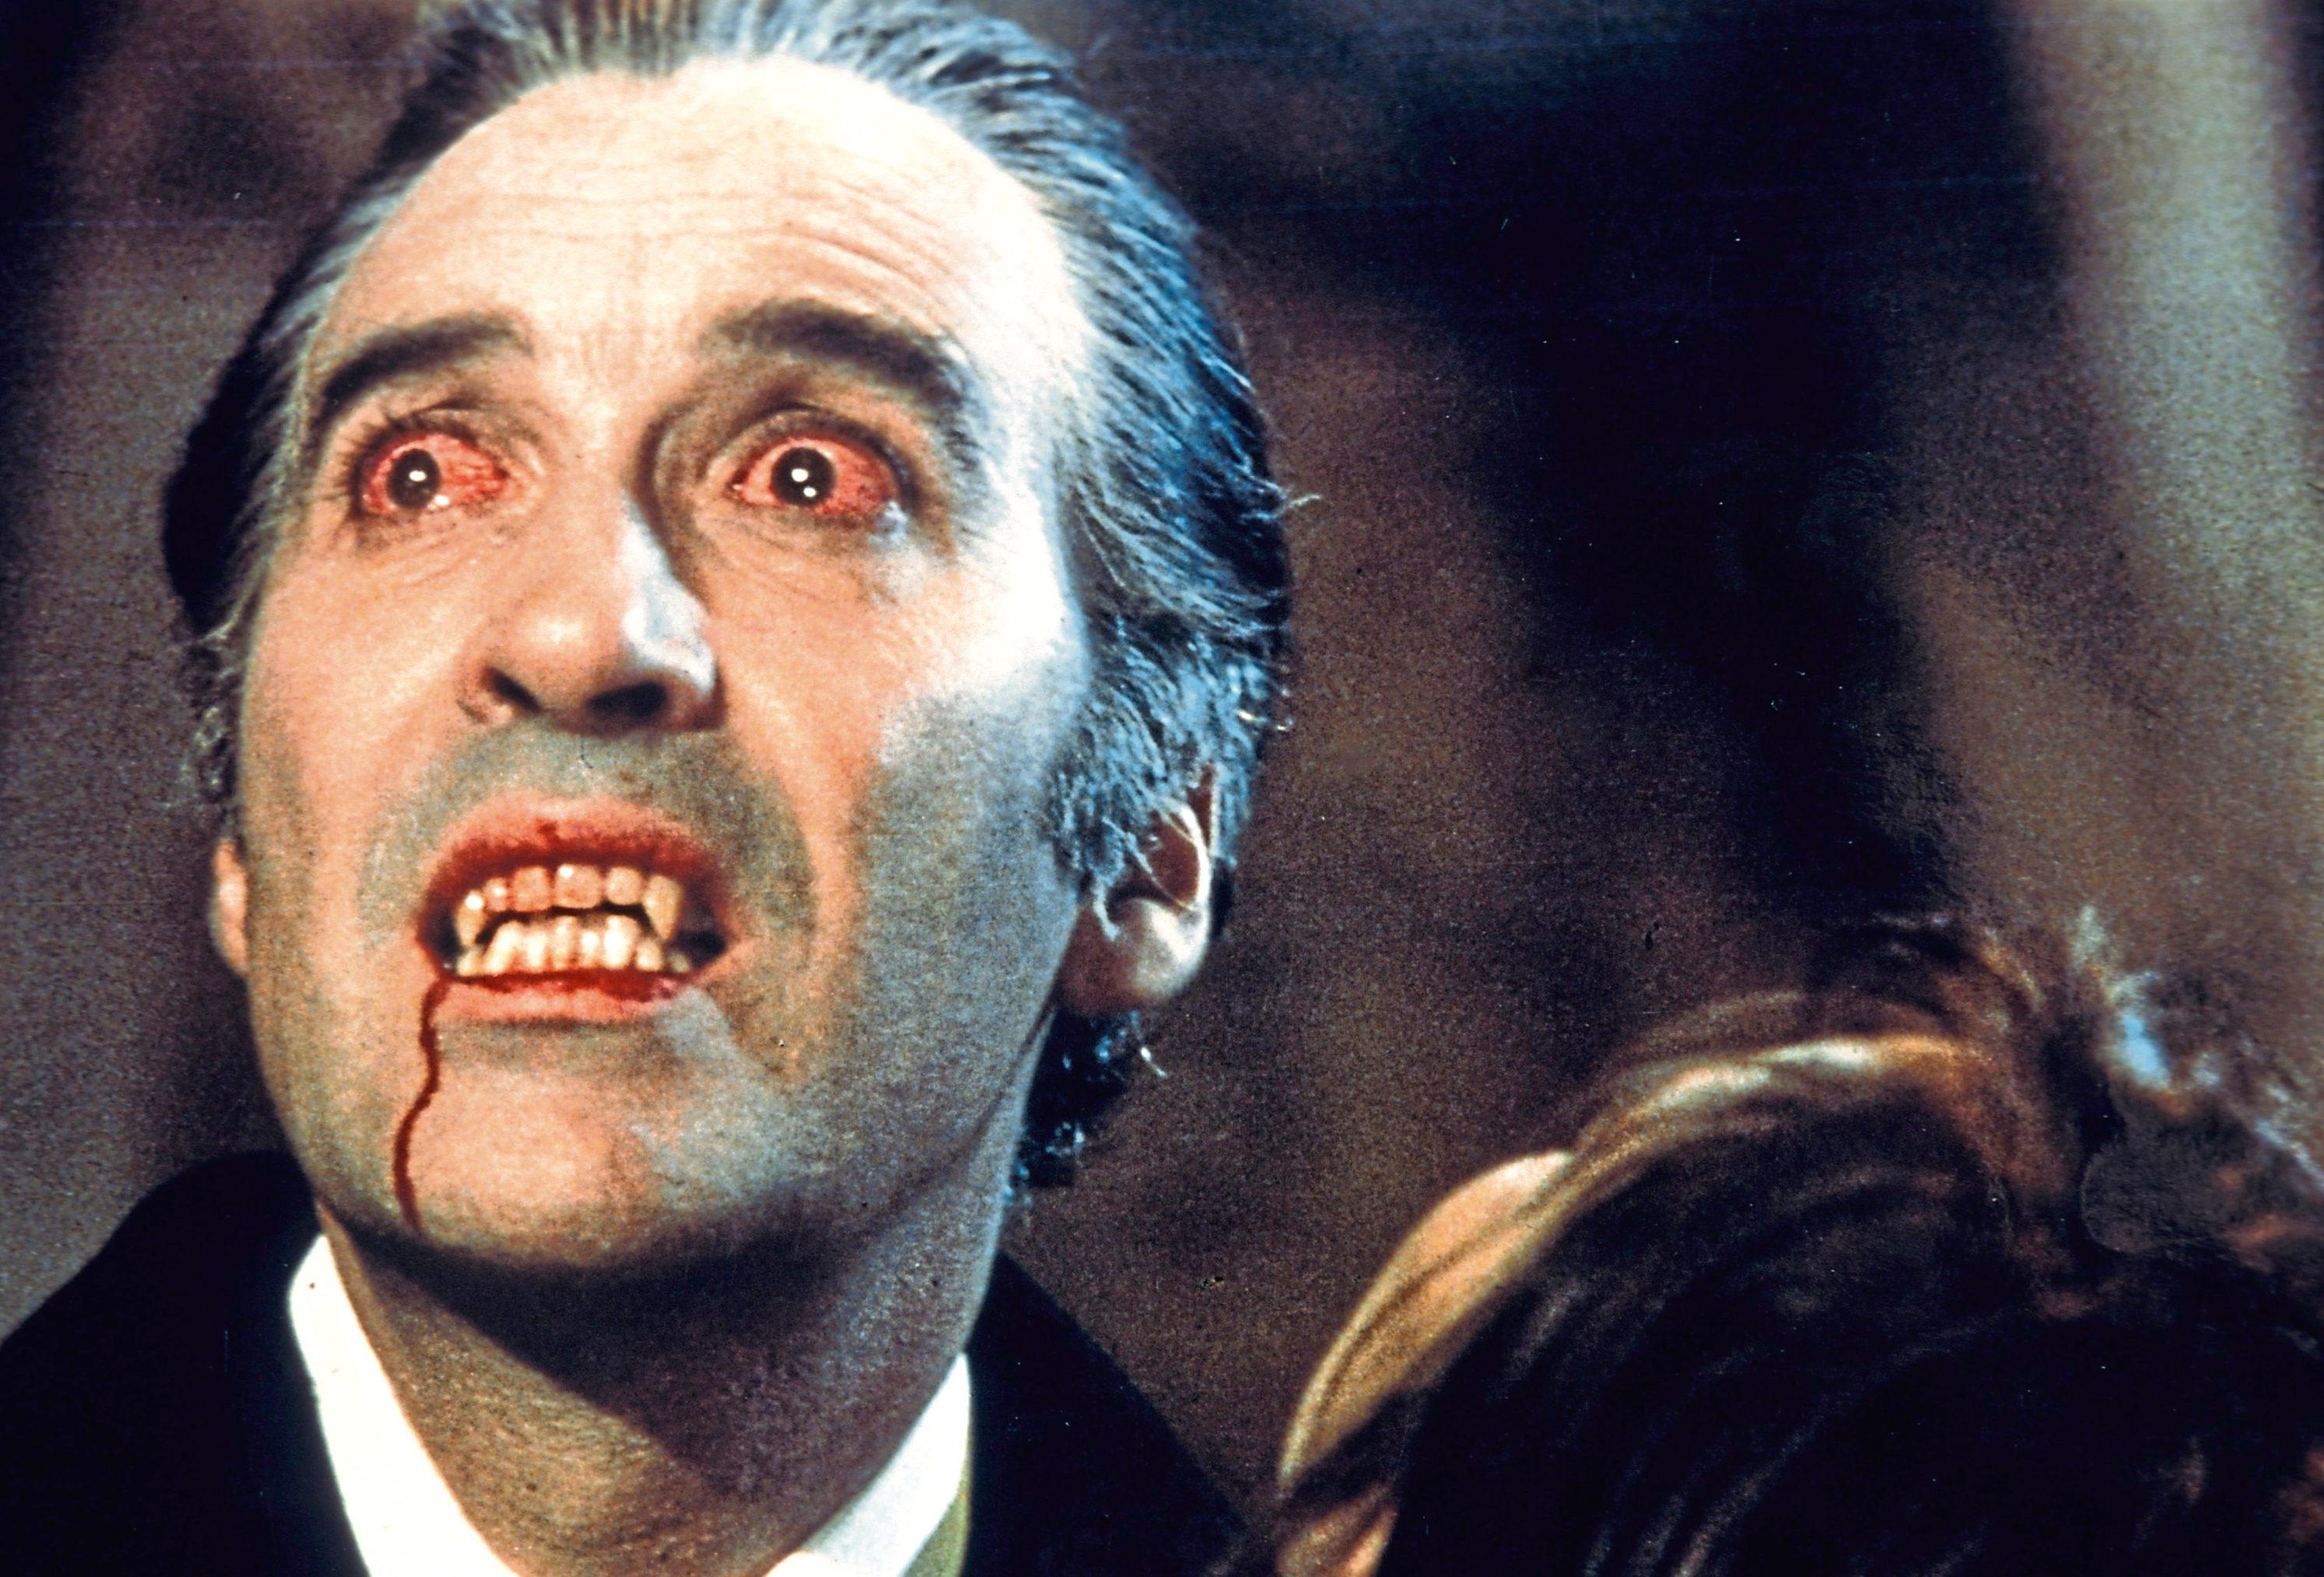 Christopher Lee as Dracula, 1958 (Allstar / HAMMER FILM )